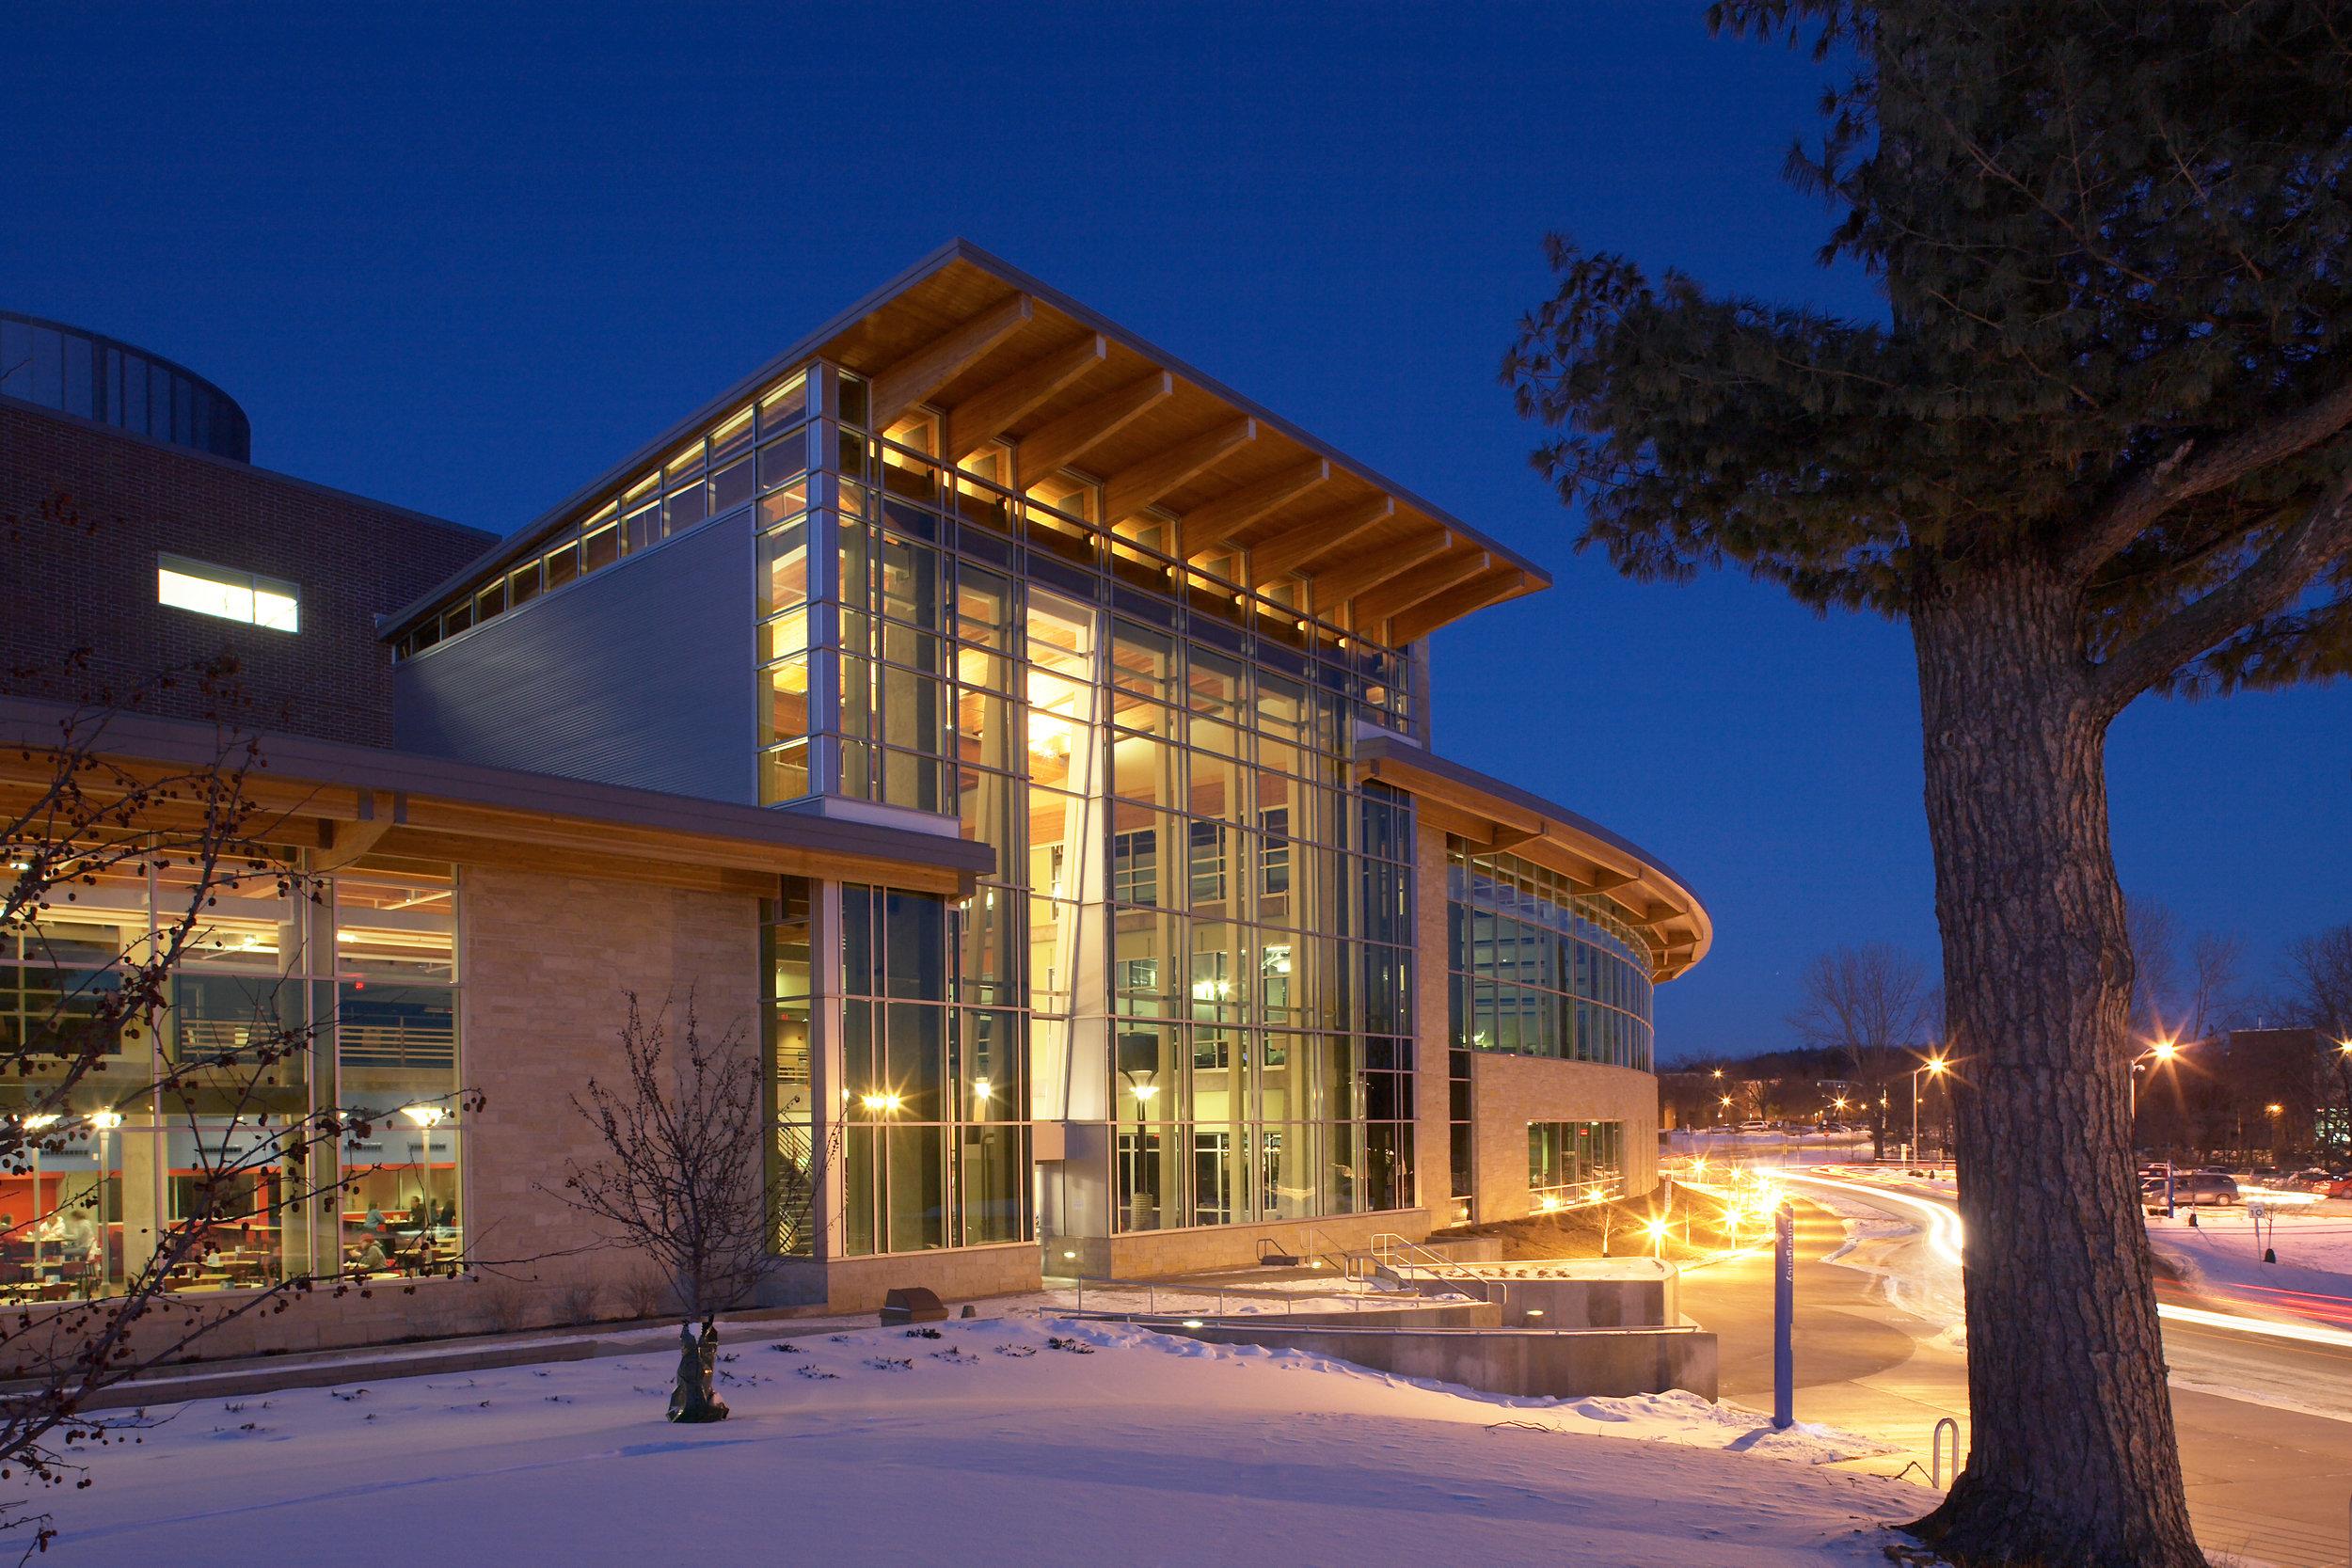 University of Wisconsin – River Falls University Center